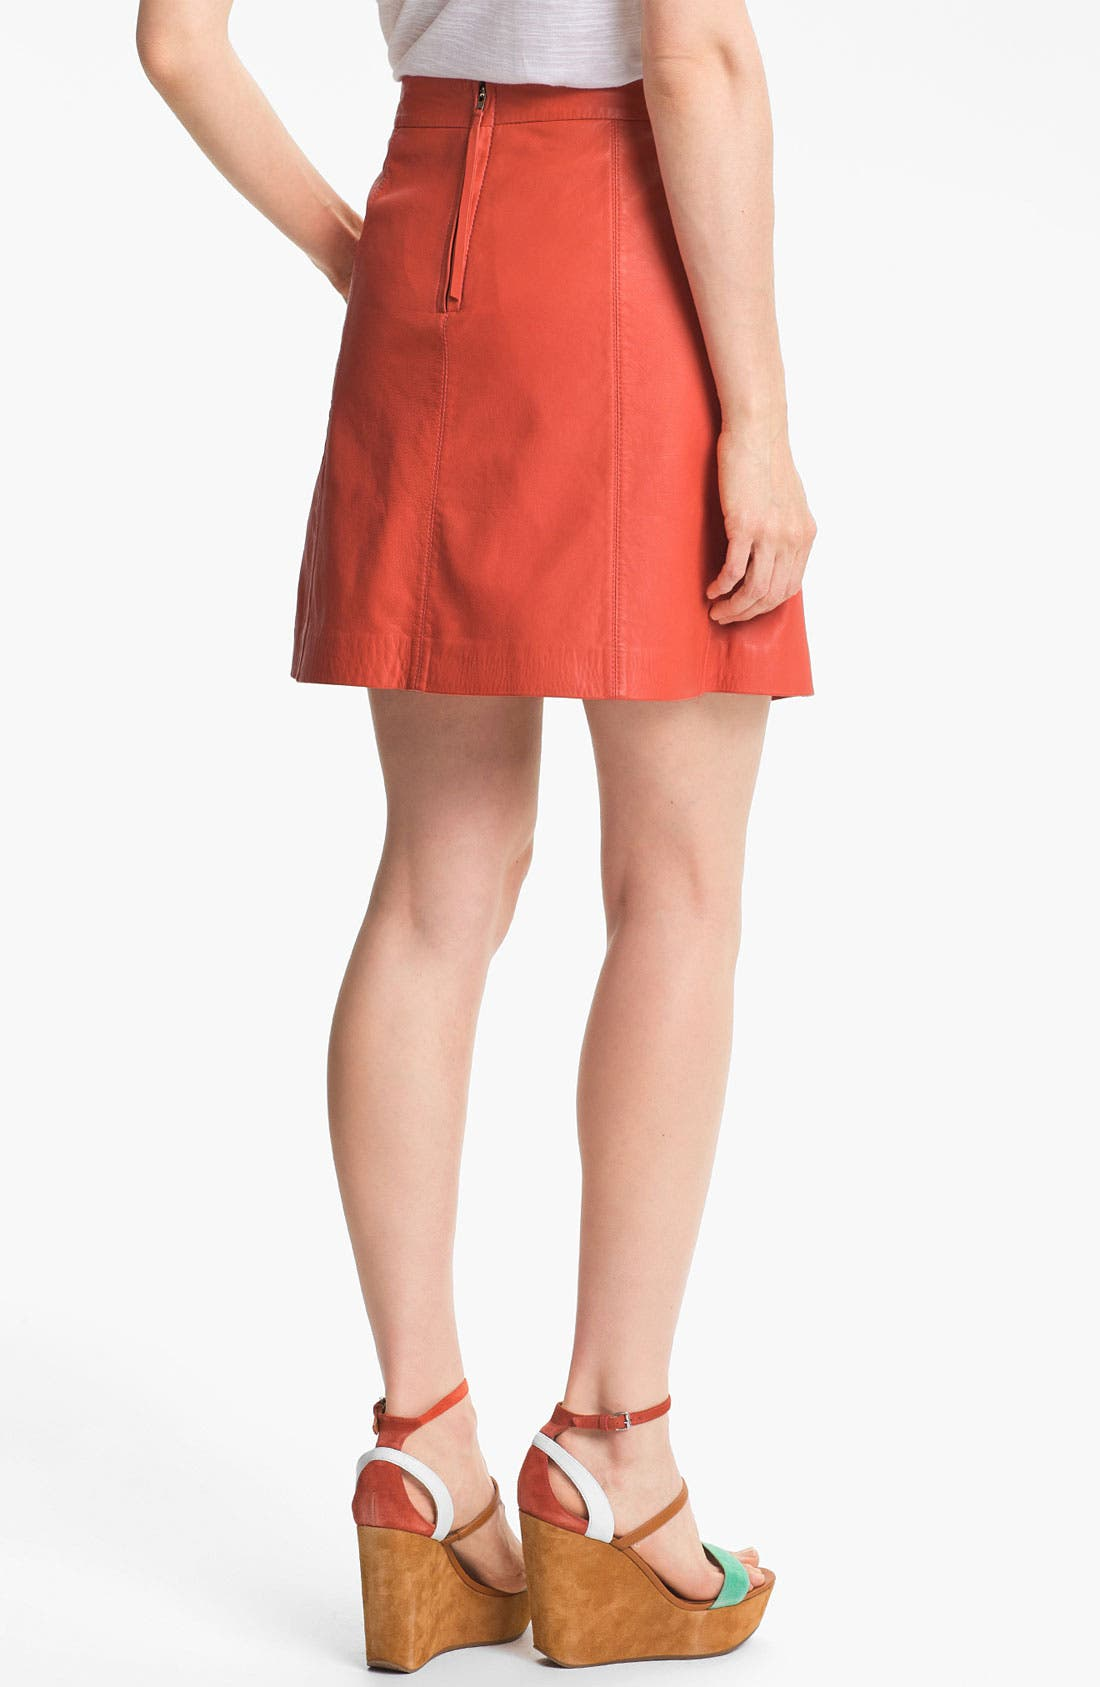 Alternate Image 2  - MARC BY MARC JACOBS 'Jett' Leather Skirt